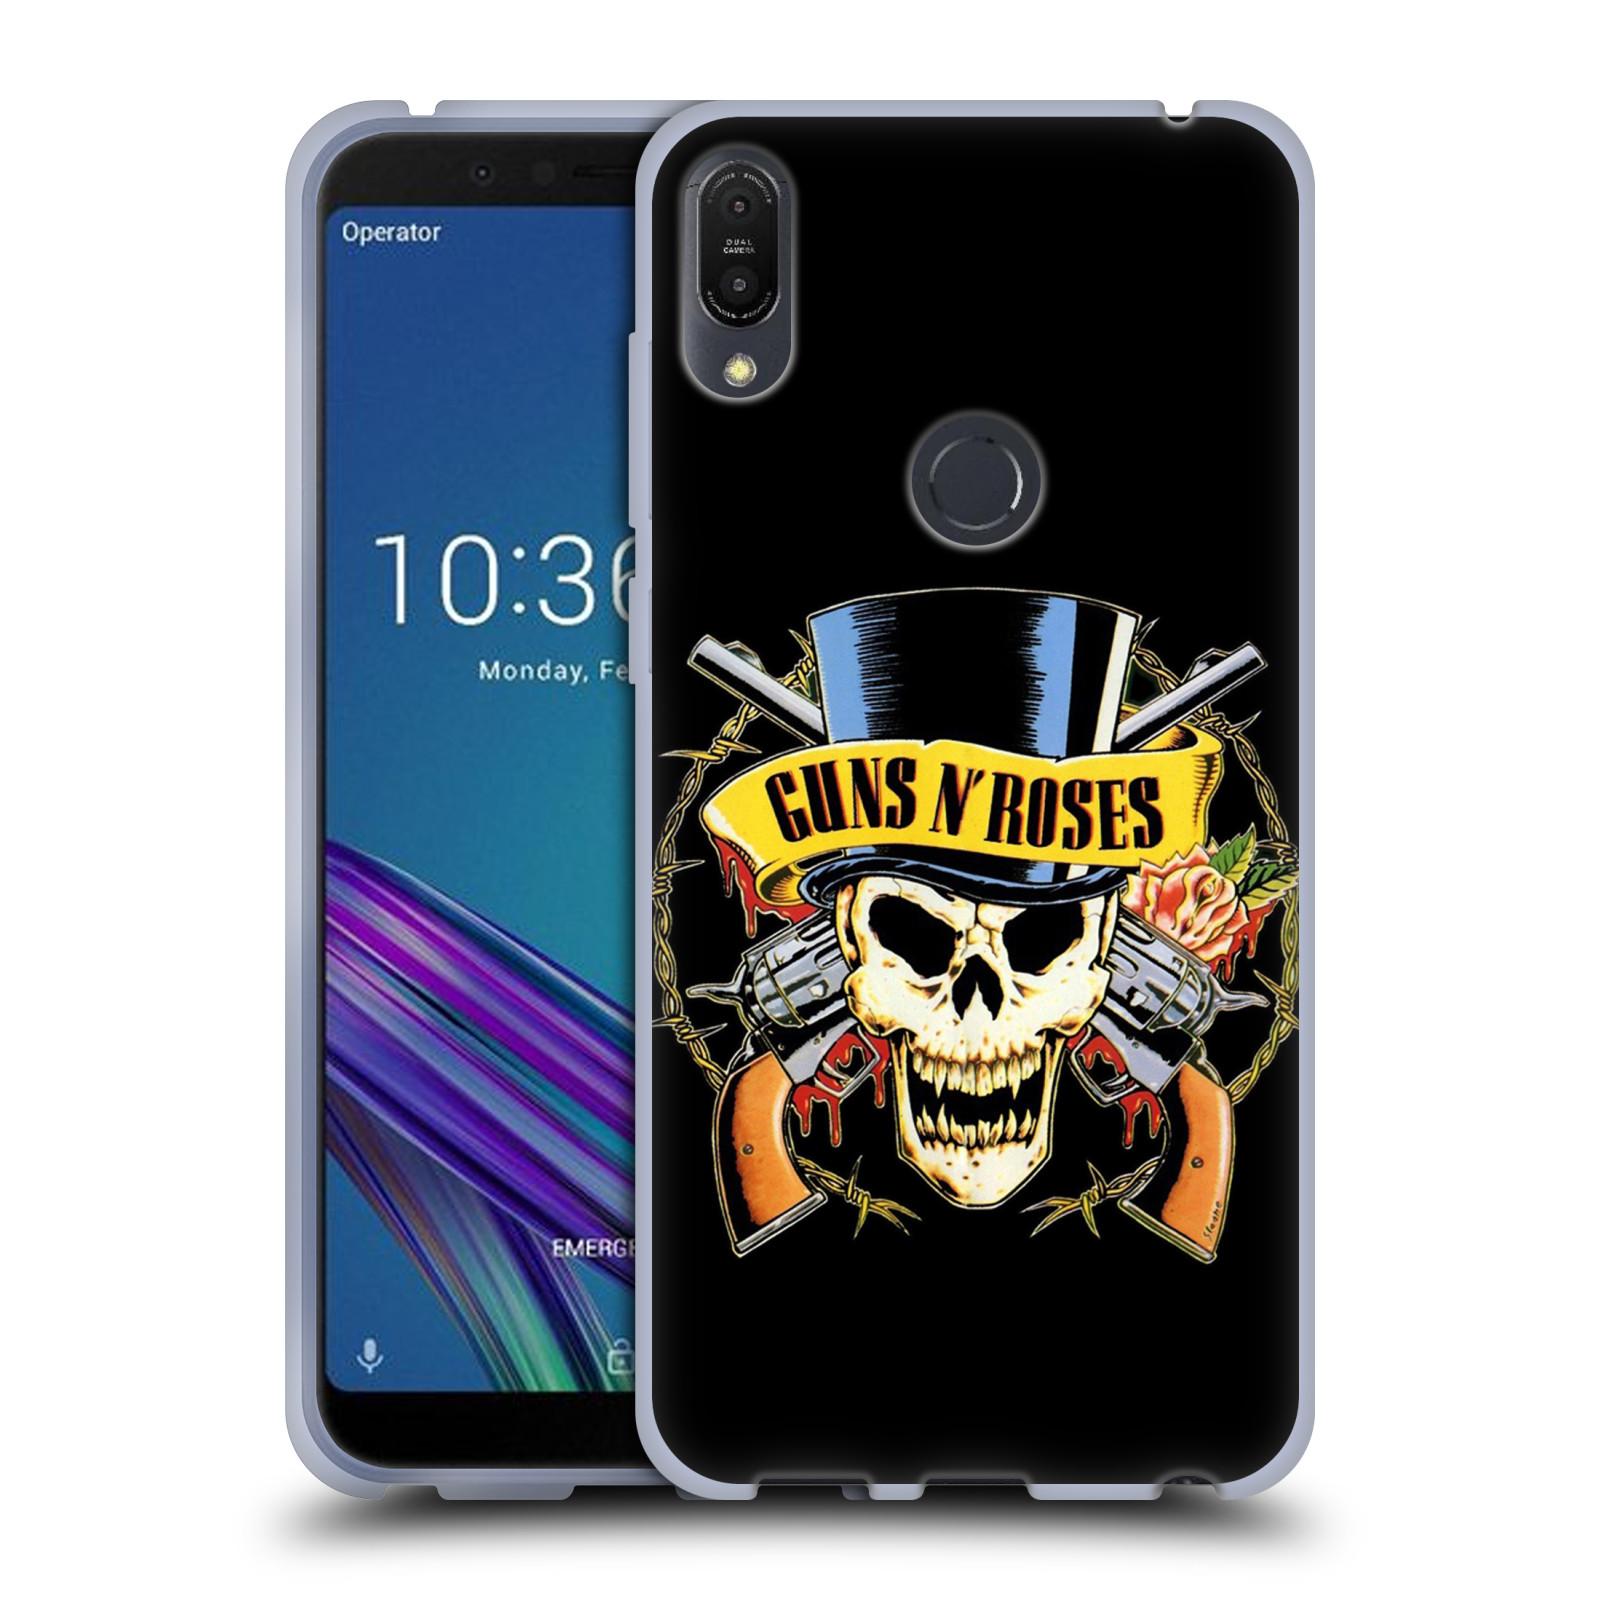 Silikonové pouzdro na mobil Asus ZenFone Max Pro (M1) - Head Case - Guns N' Roses - Lebka